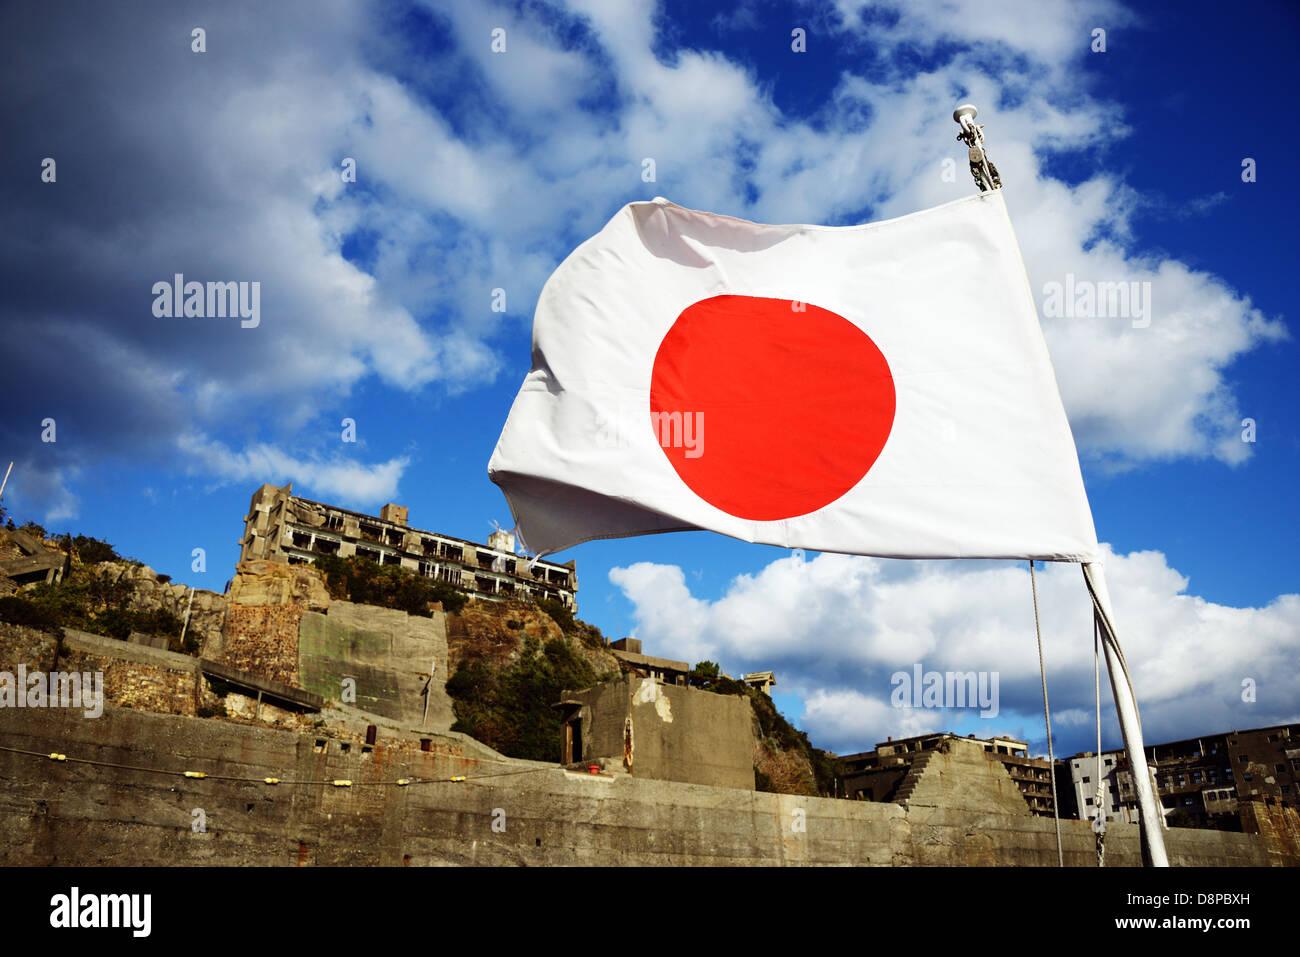 Japanischen Insel Gunkanjima aufgegeben Stockbild